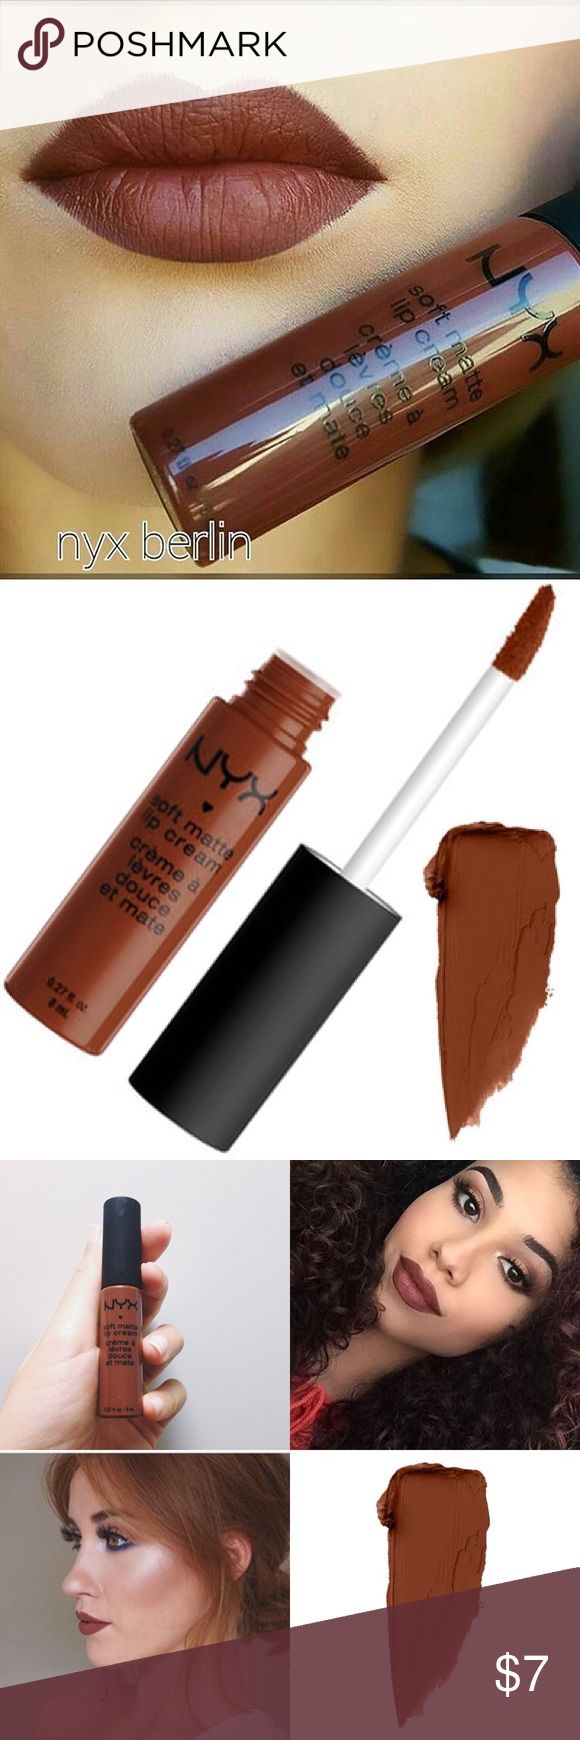 NYX *Berlin* SOFT MATTE LIP CREAM! NEW NYX Cosmetics Makeup